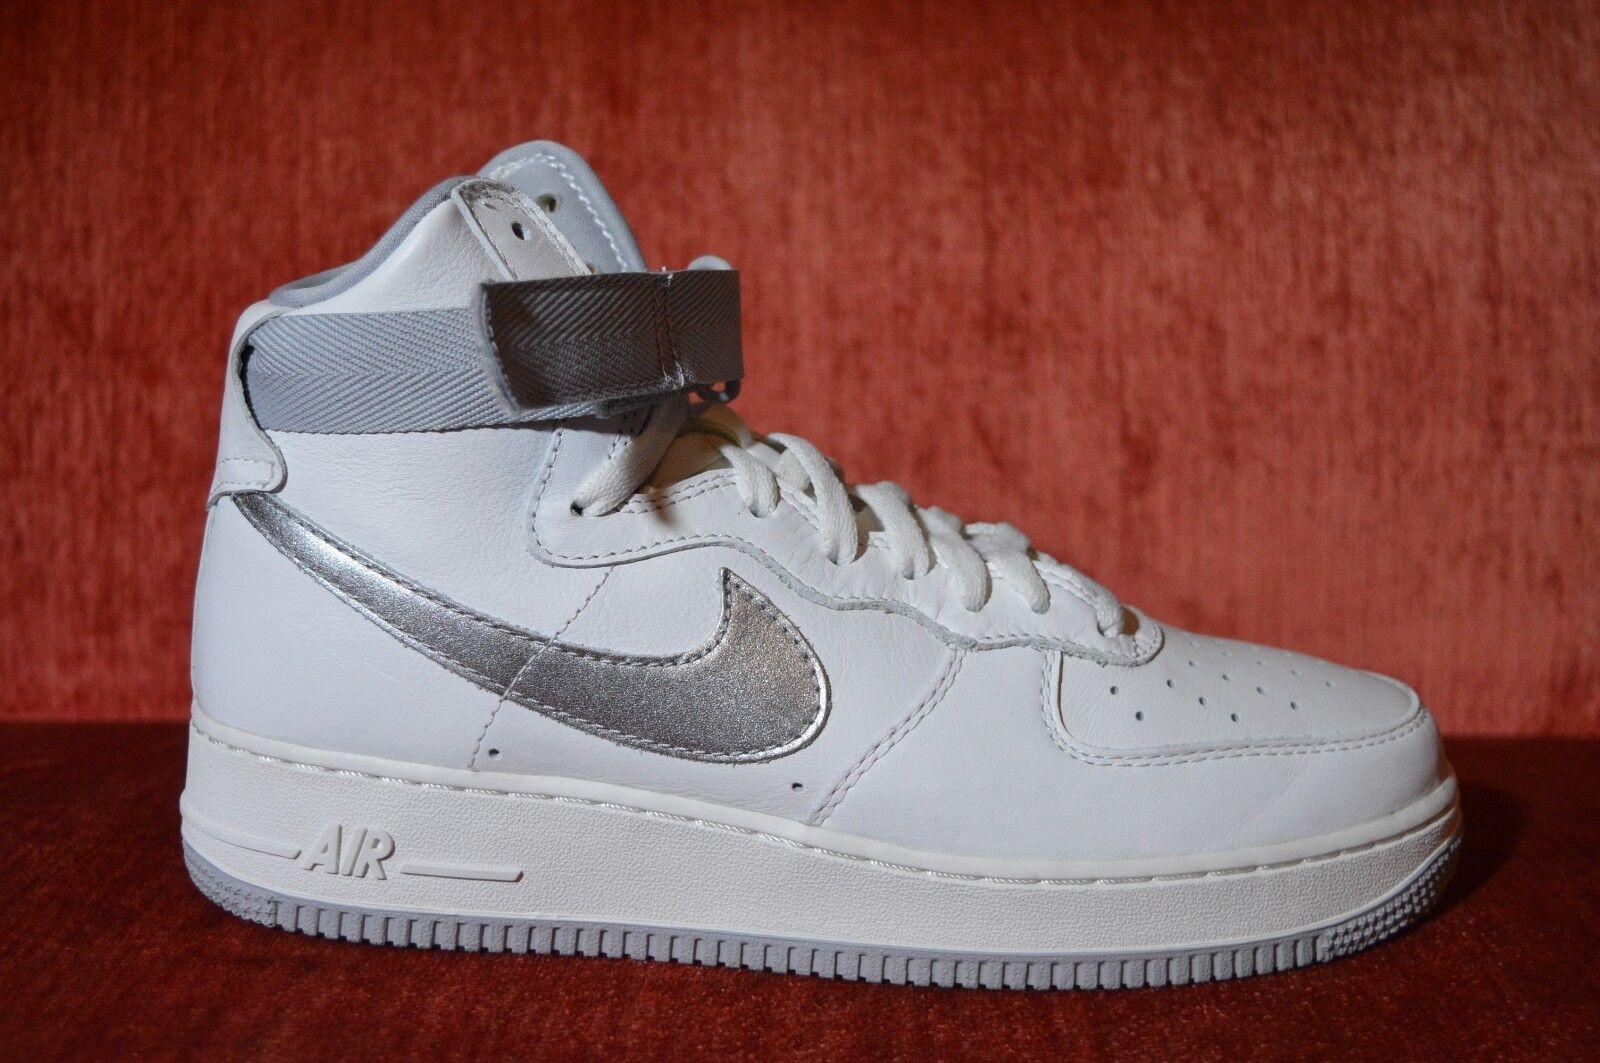 Nike Air Force 1 Hi Retro QS Summit White Wolf Grey 743546-101 Mens Size 9.5